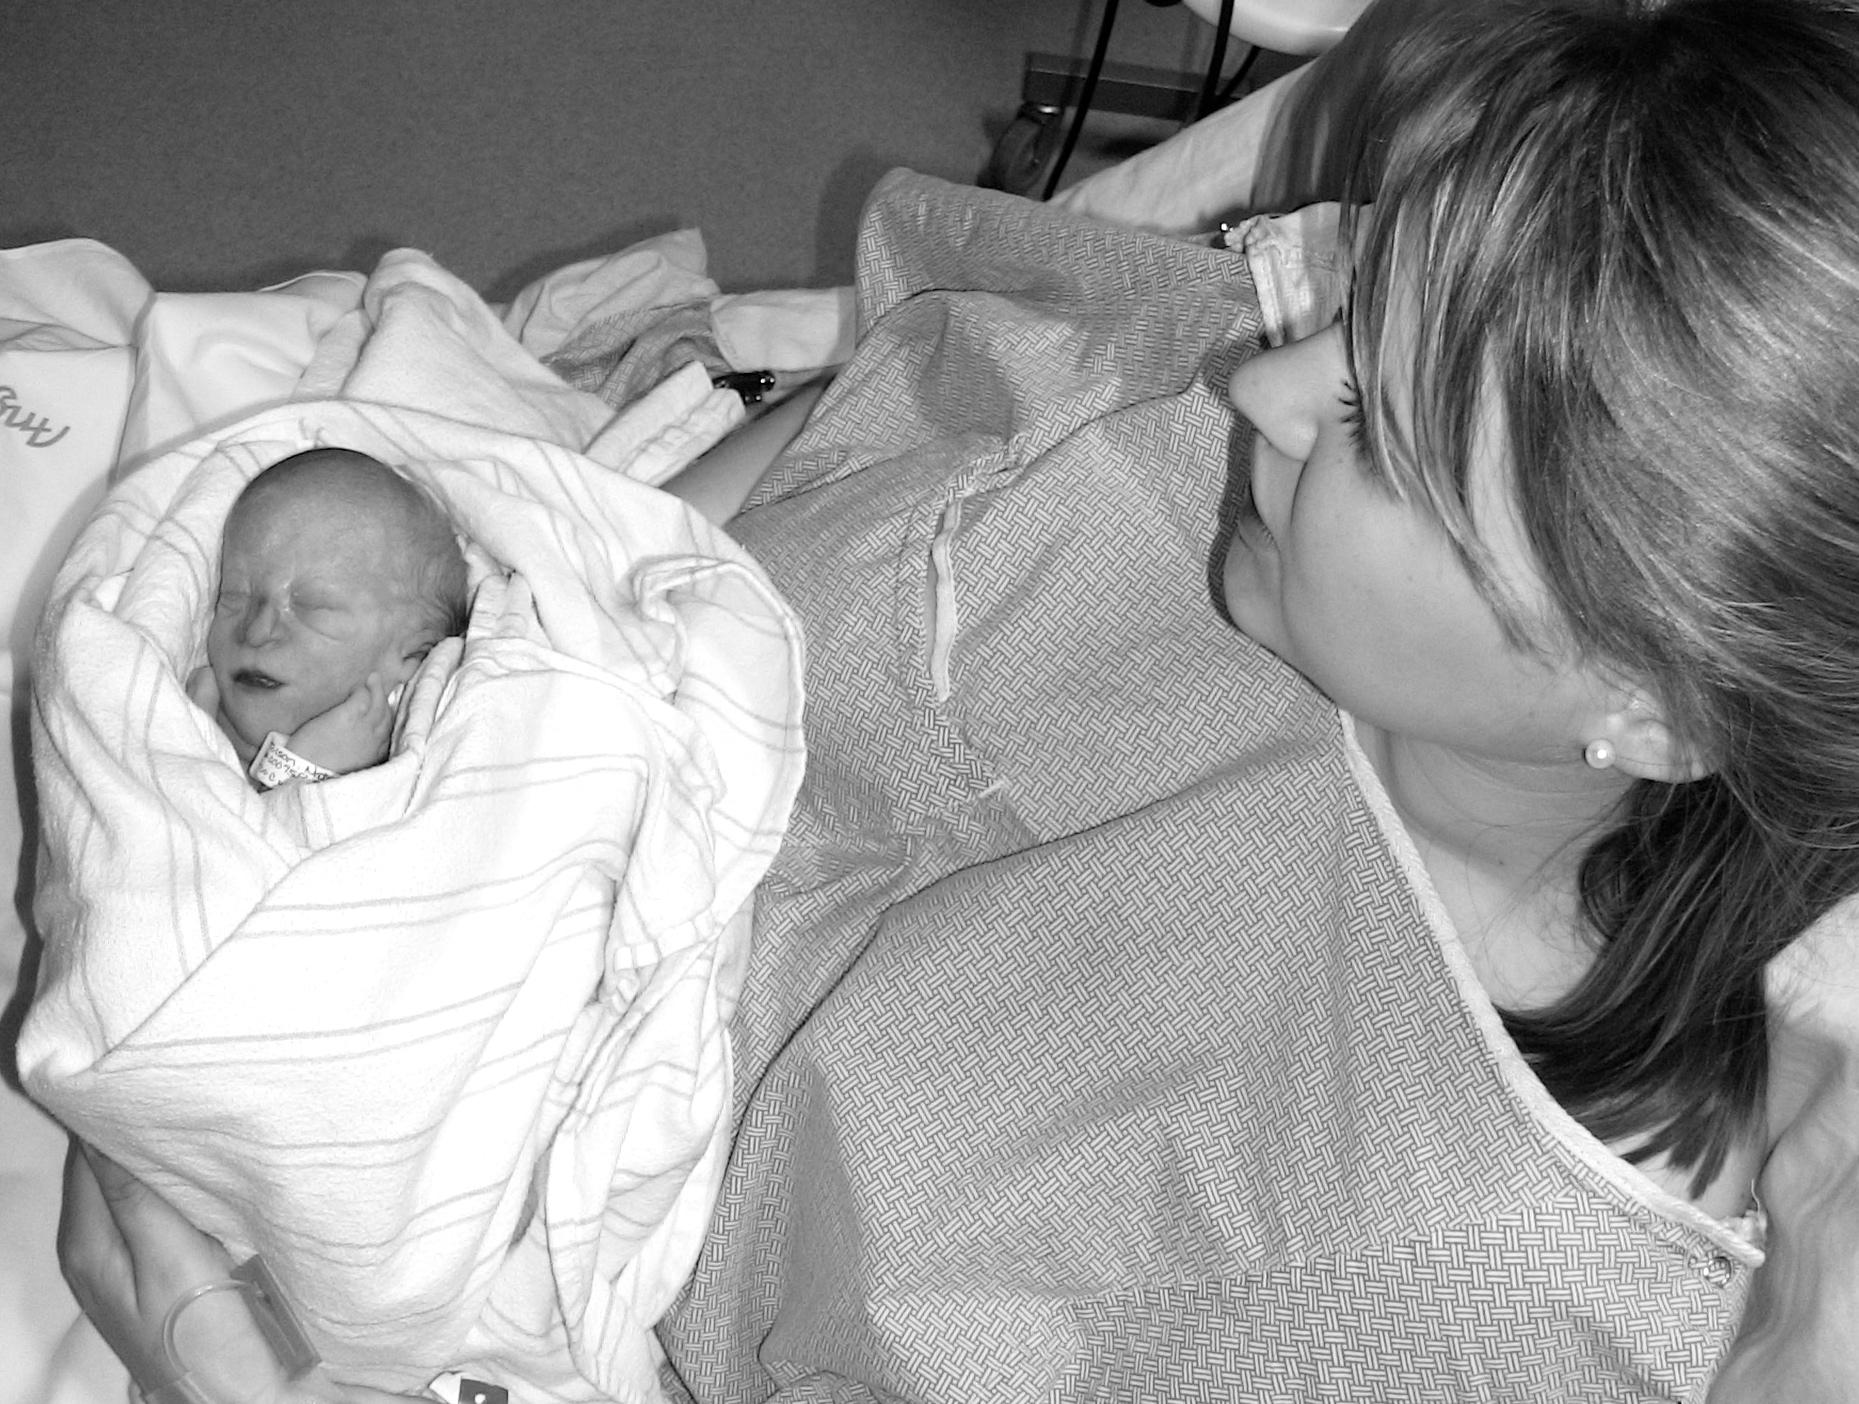 Instead was born straight into heaven from a rare congenital defect